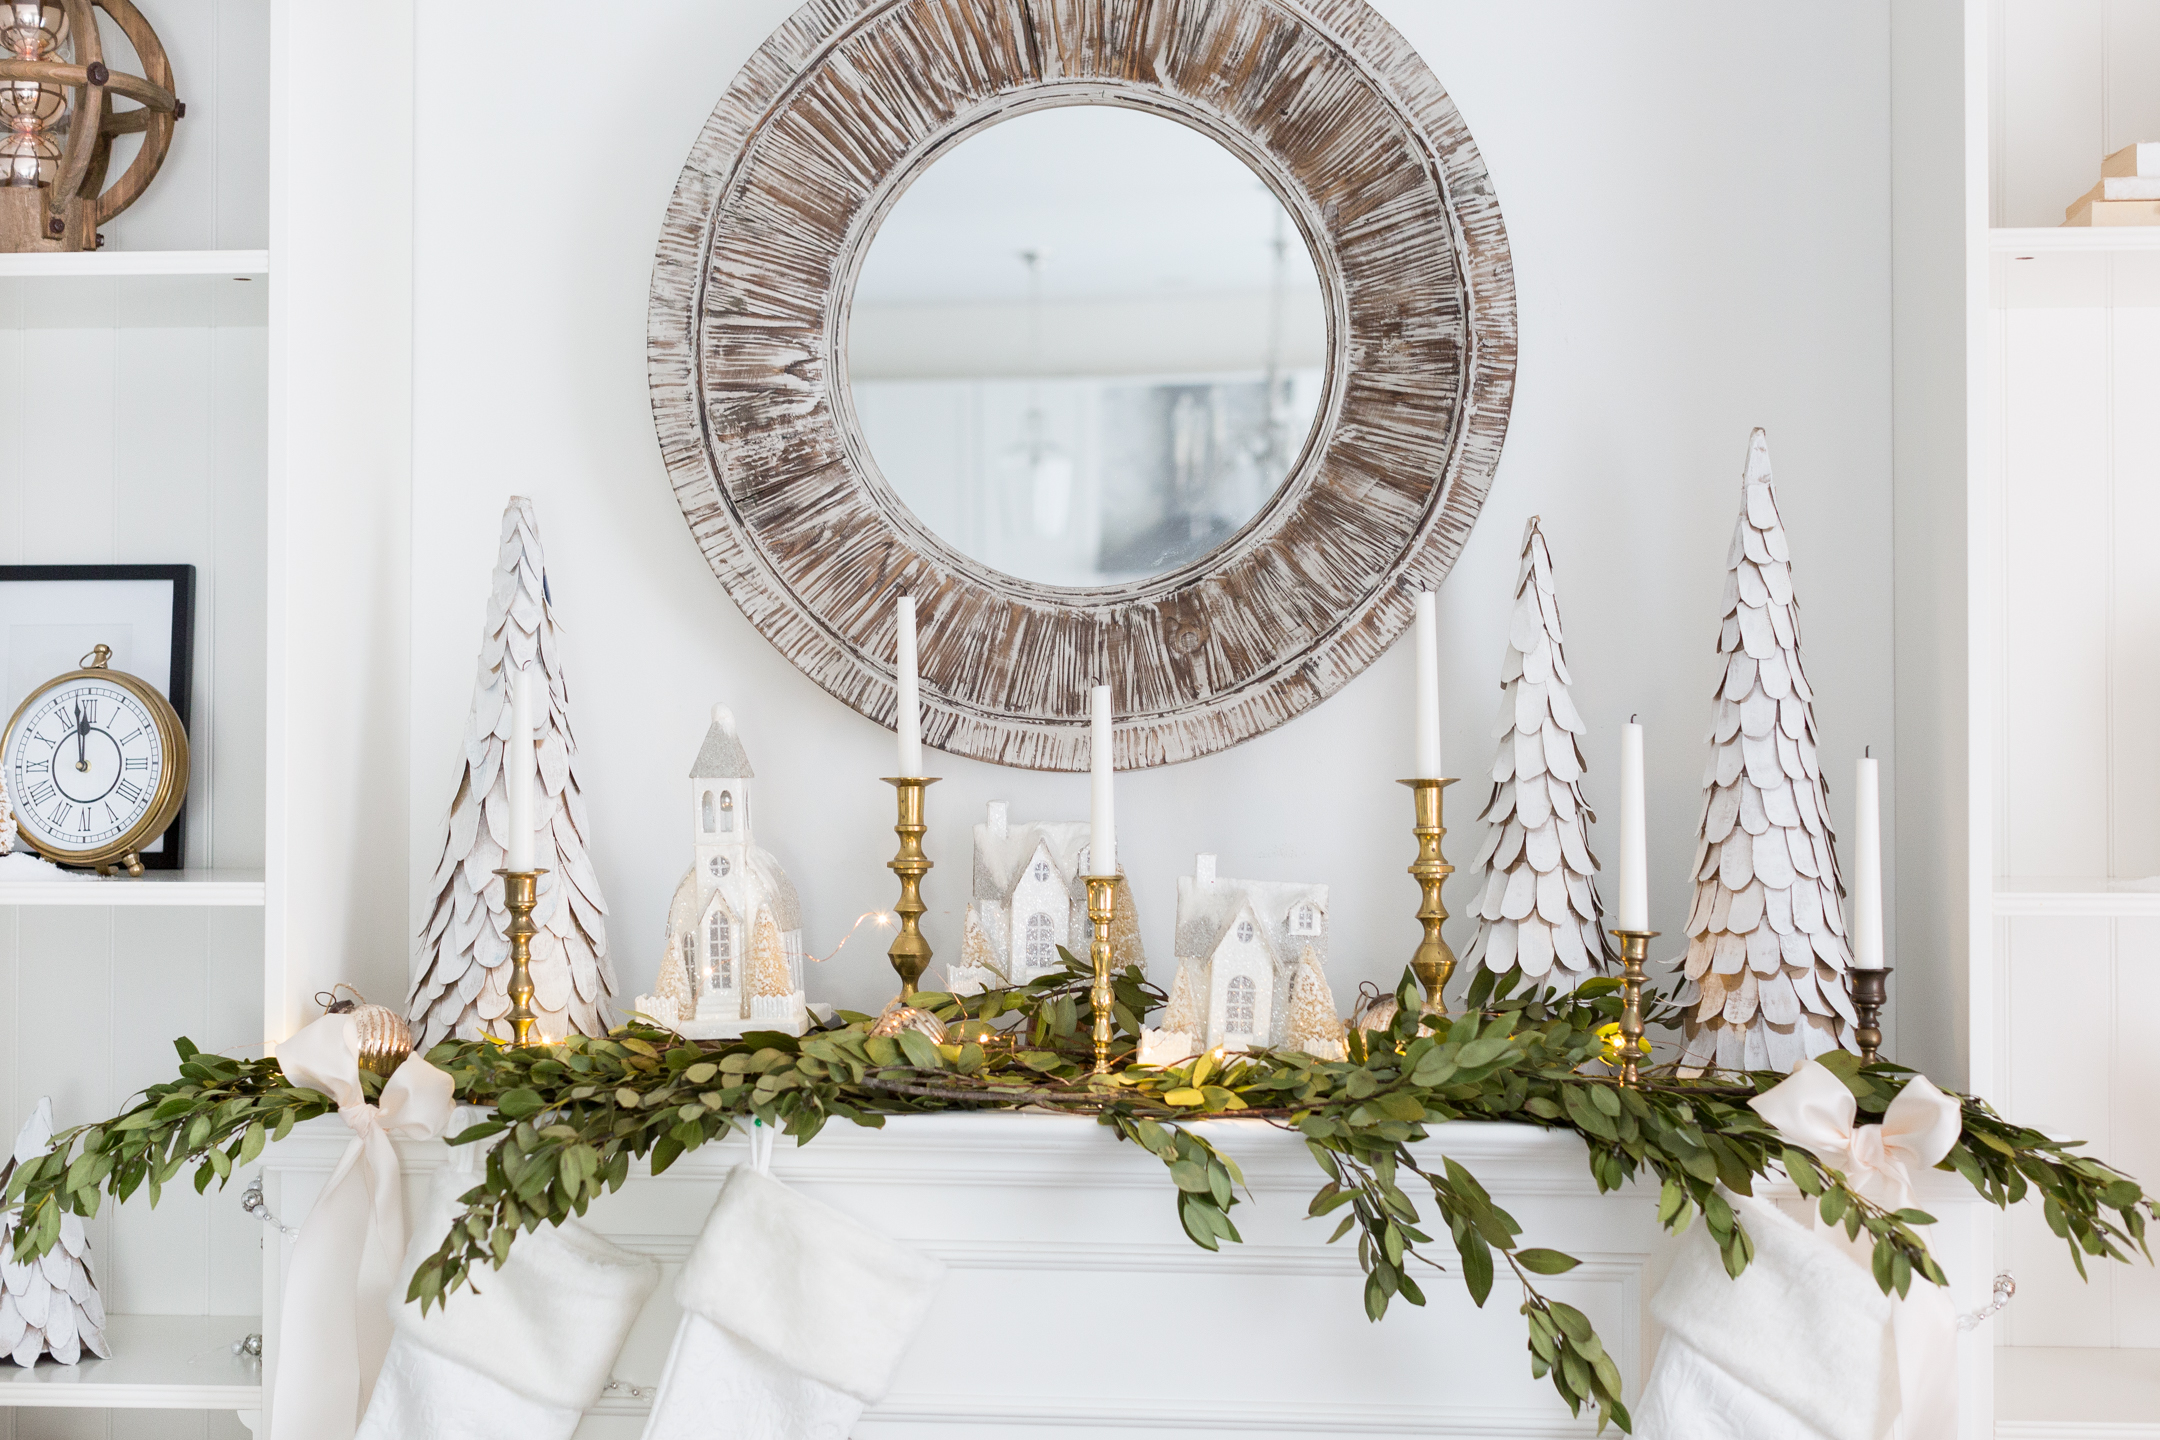 christmasfamilyroomcraftberrybush-16